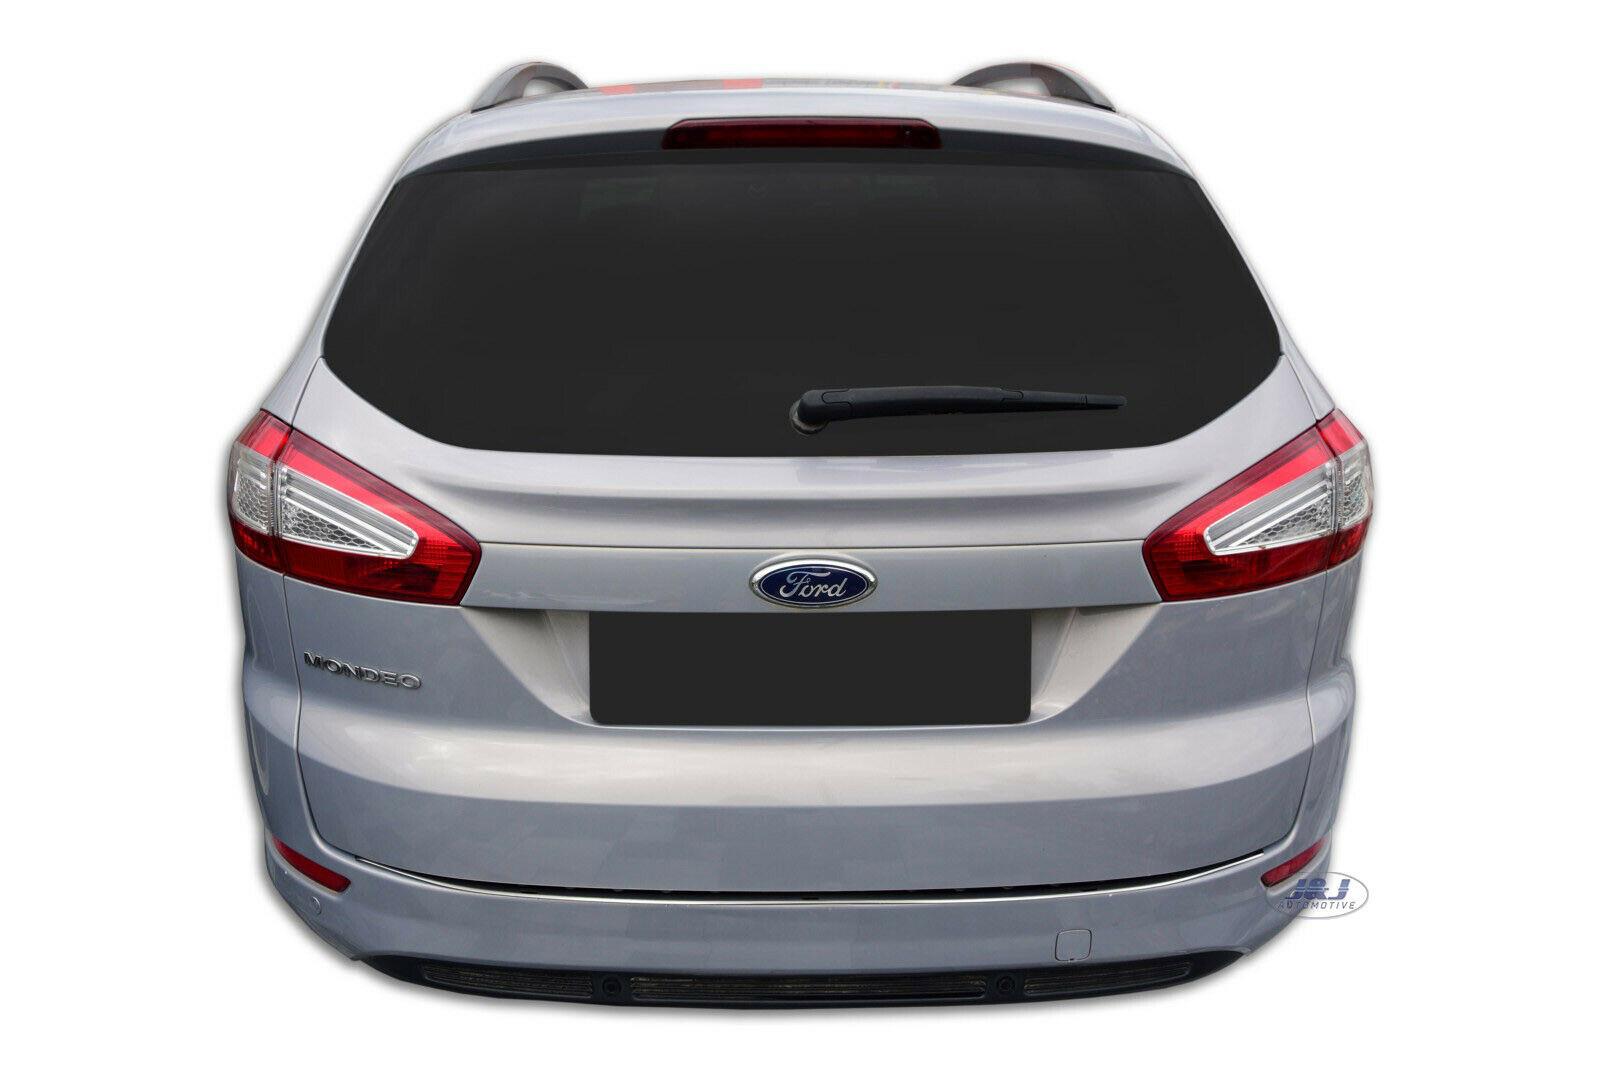 Poza cu Protectie bara spate, Ford Mondeo, 2007-2014